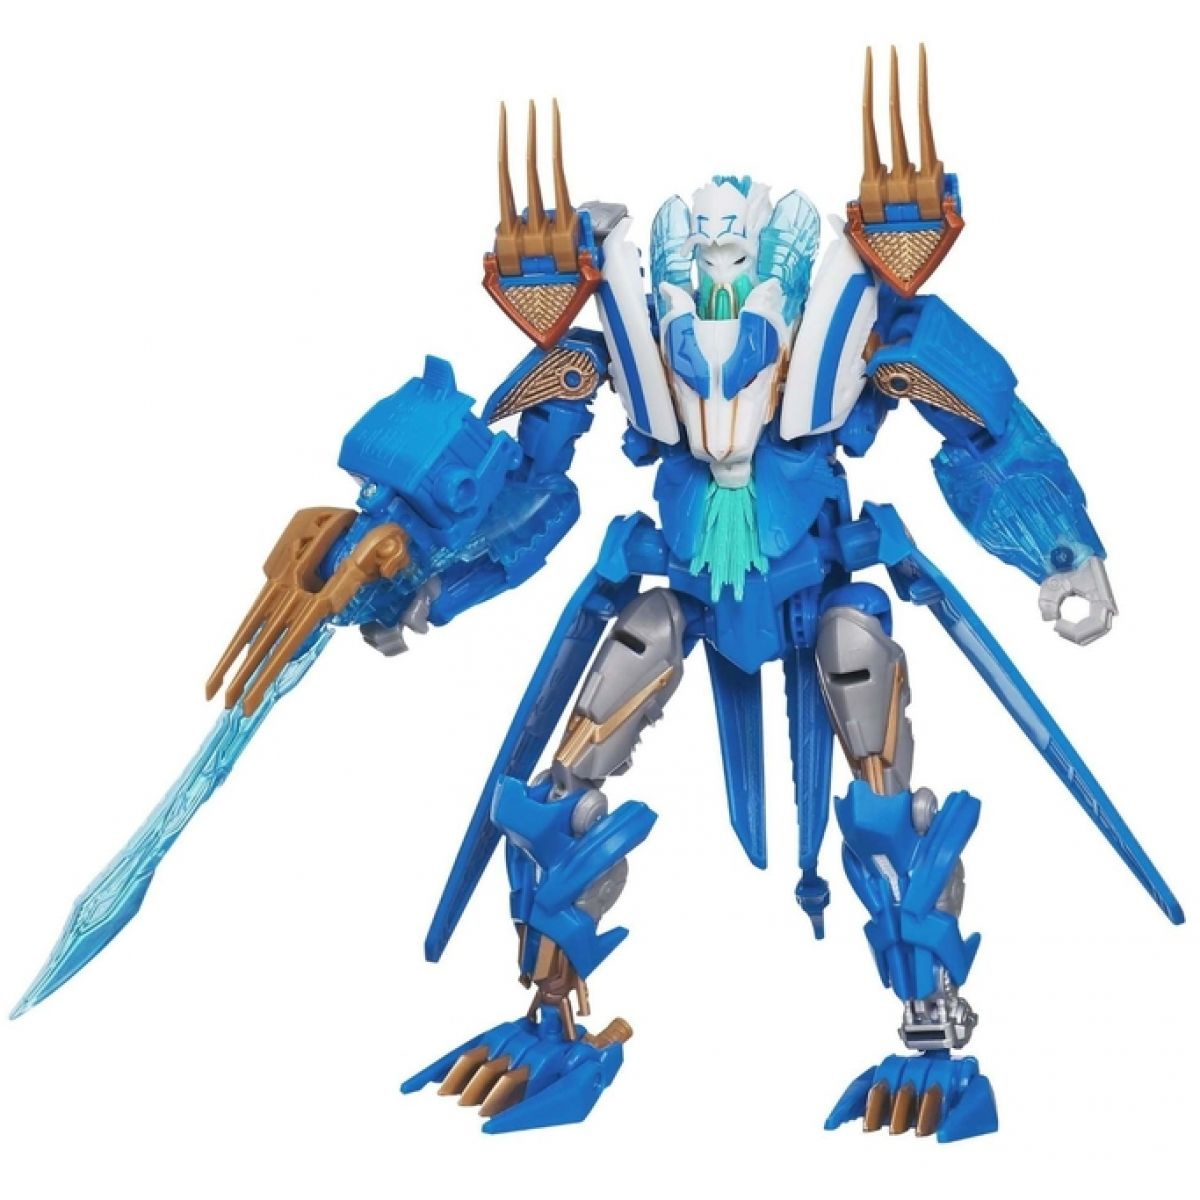 Hasbro Transformers Prime Powerizers - Thundertron